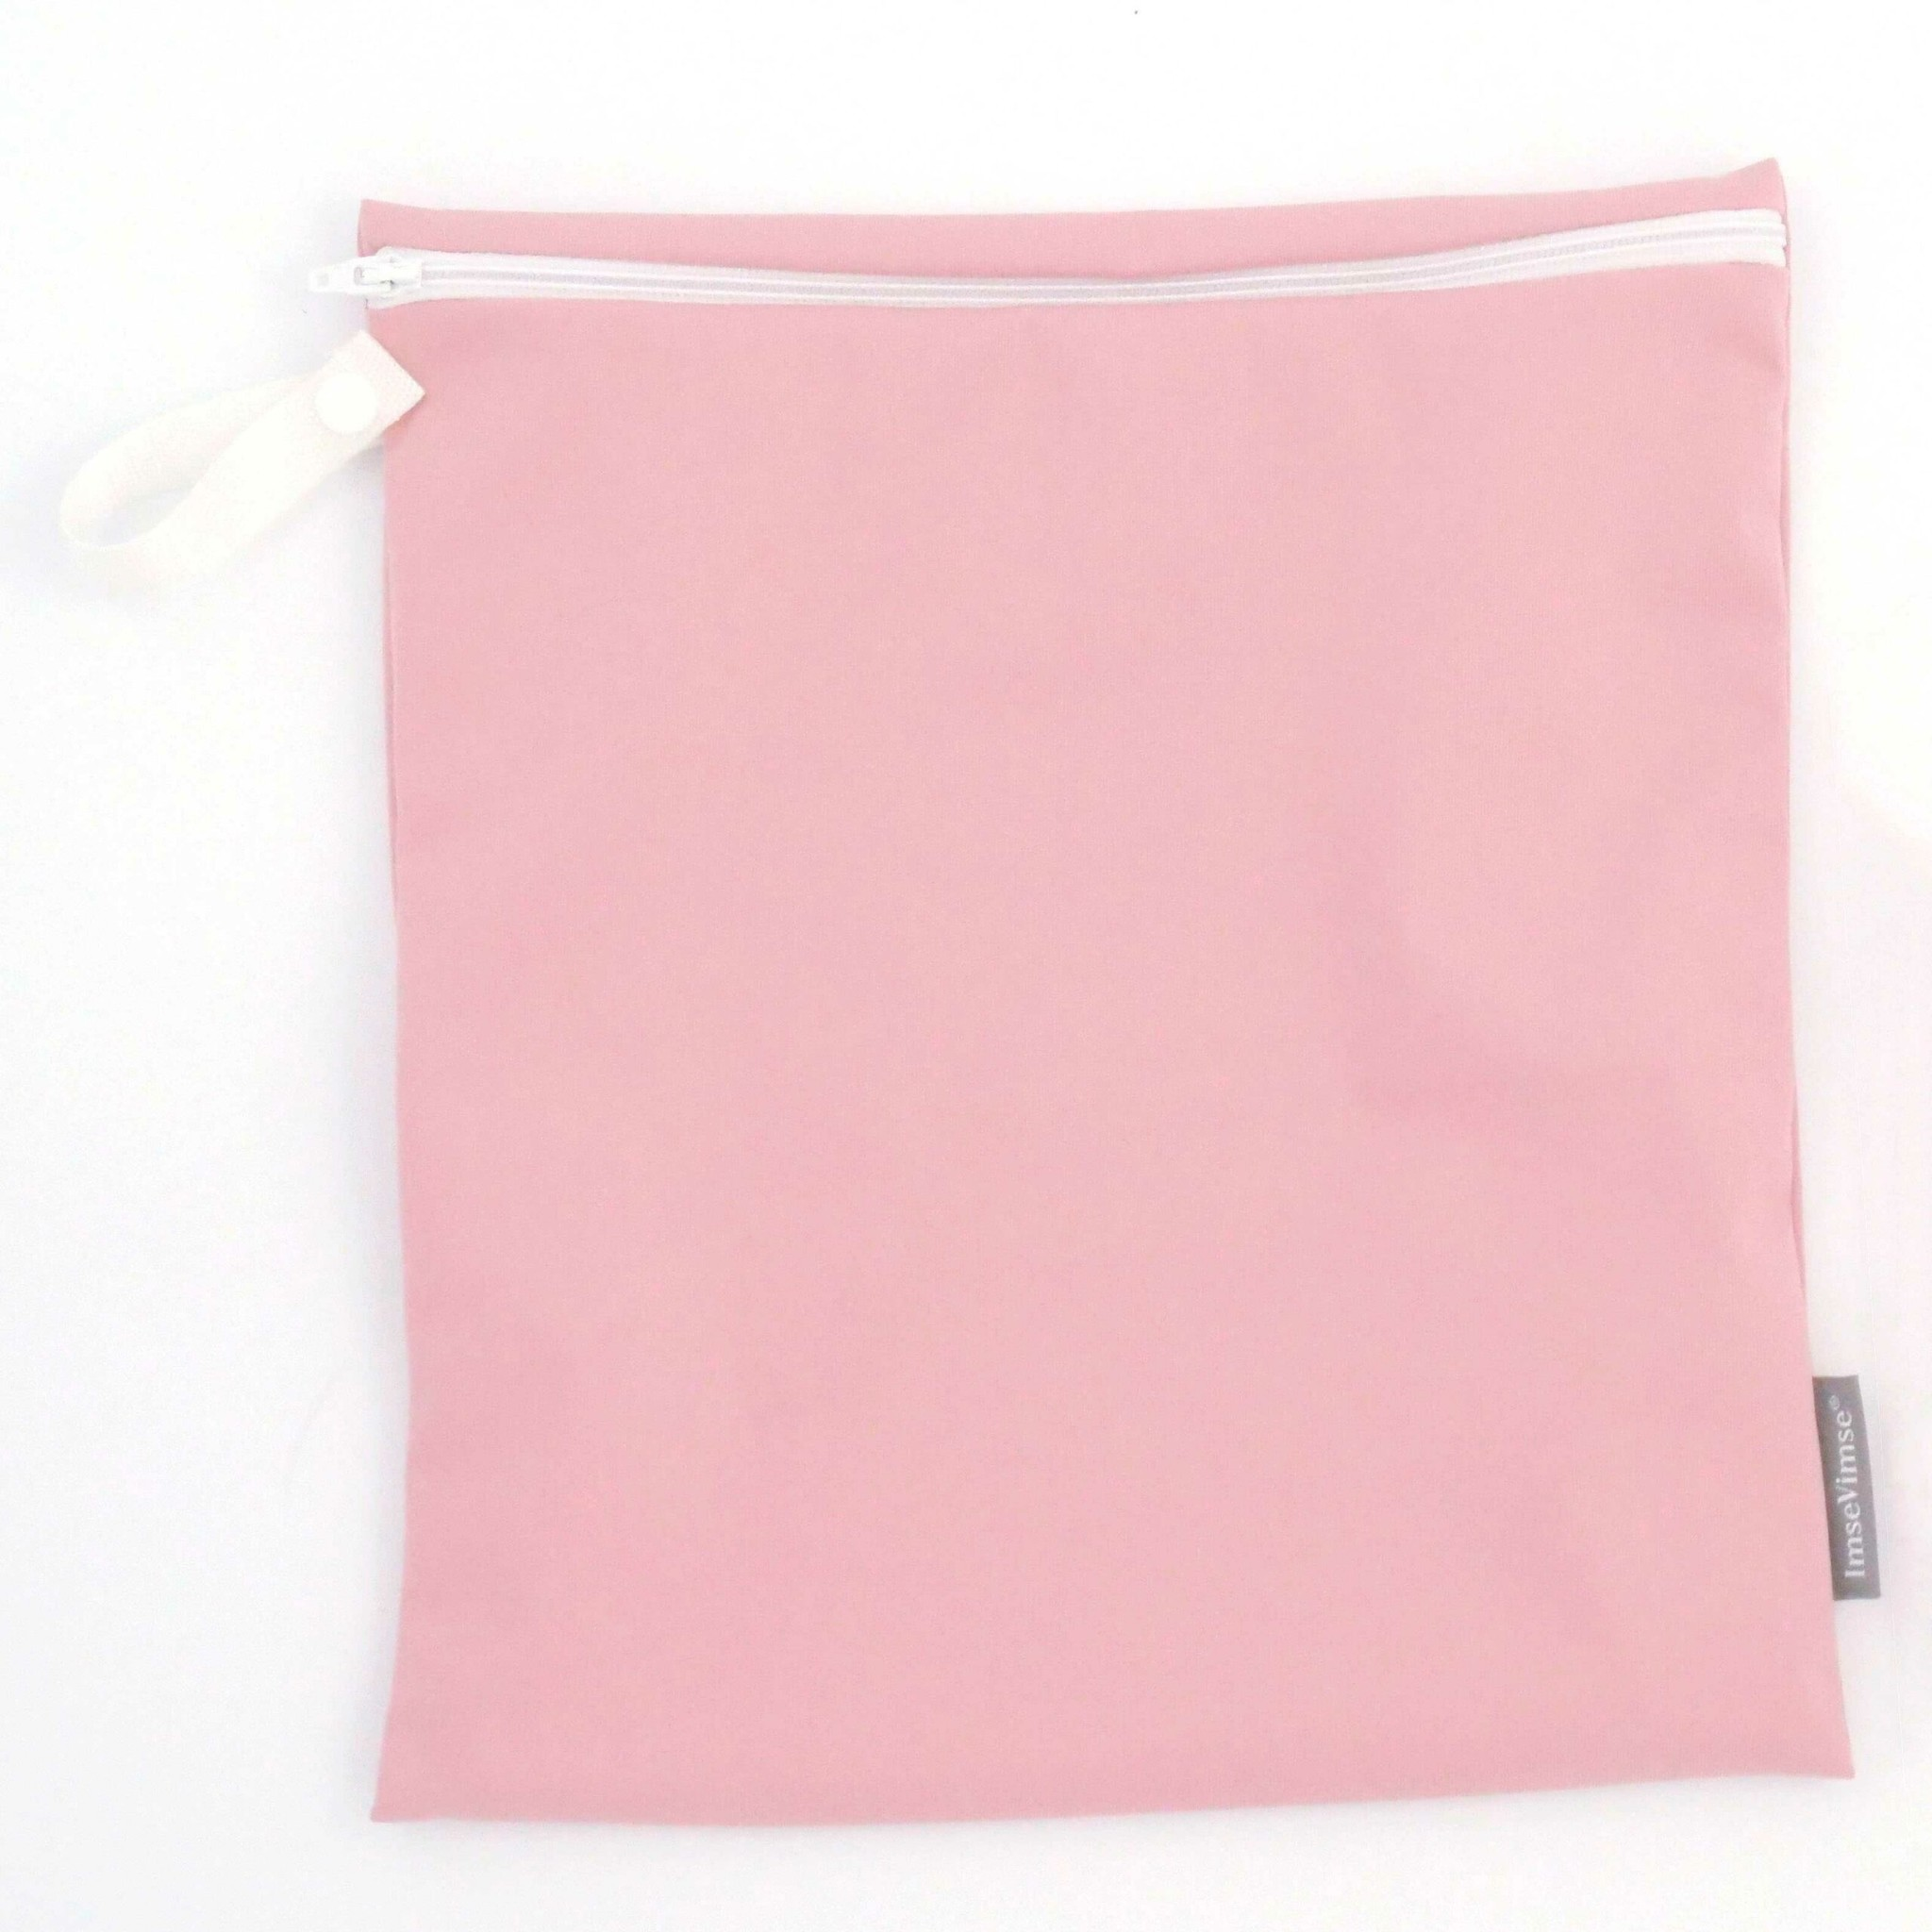 Imse Vimse® Wetbag  Medium Blossom